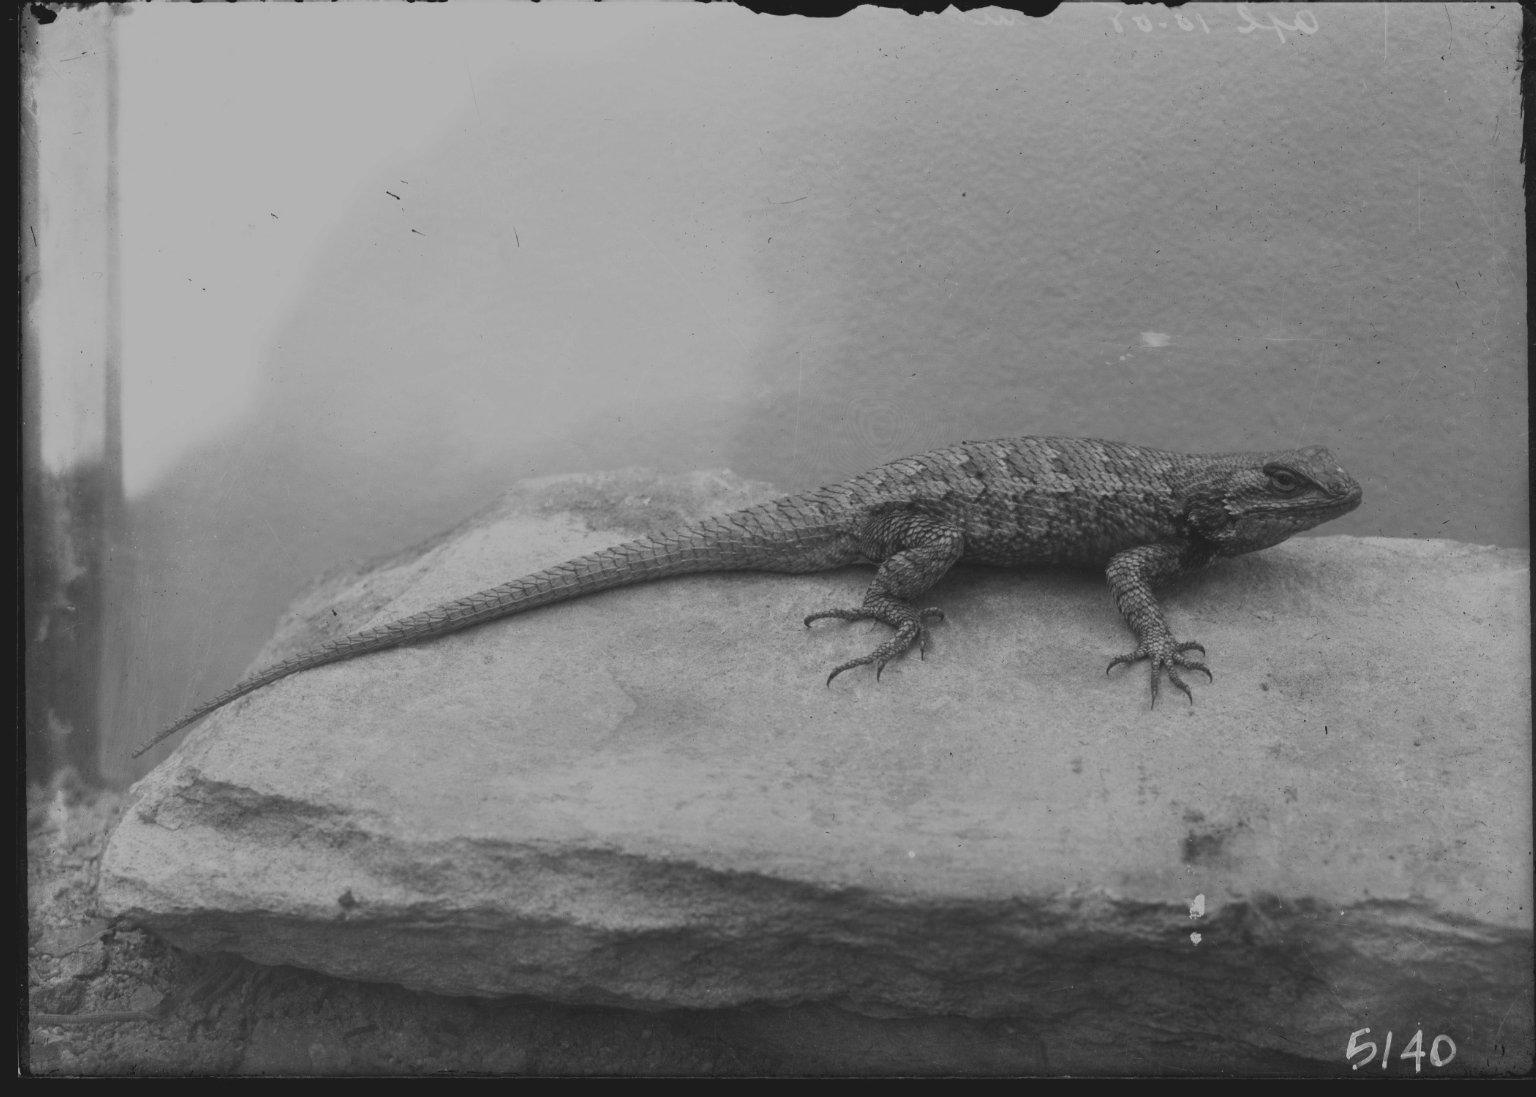 Unindentified Lizard